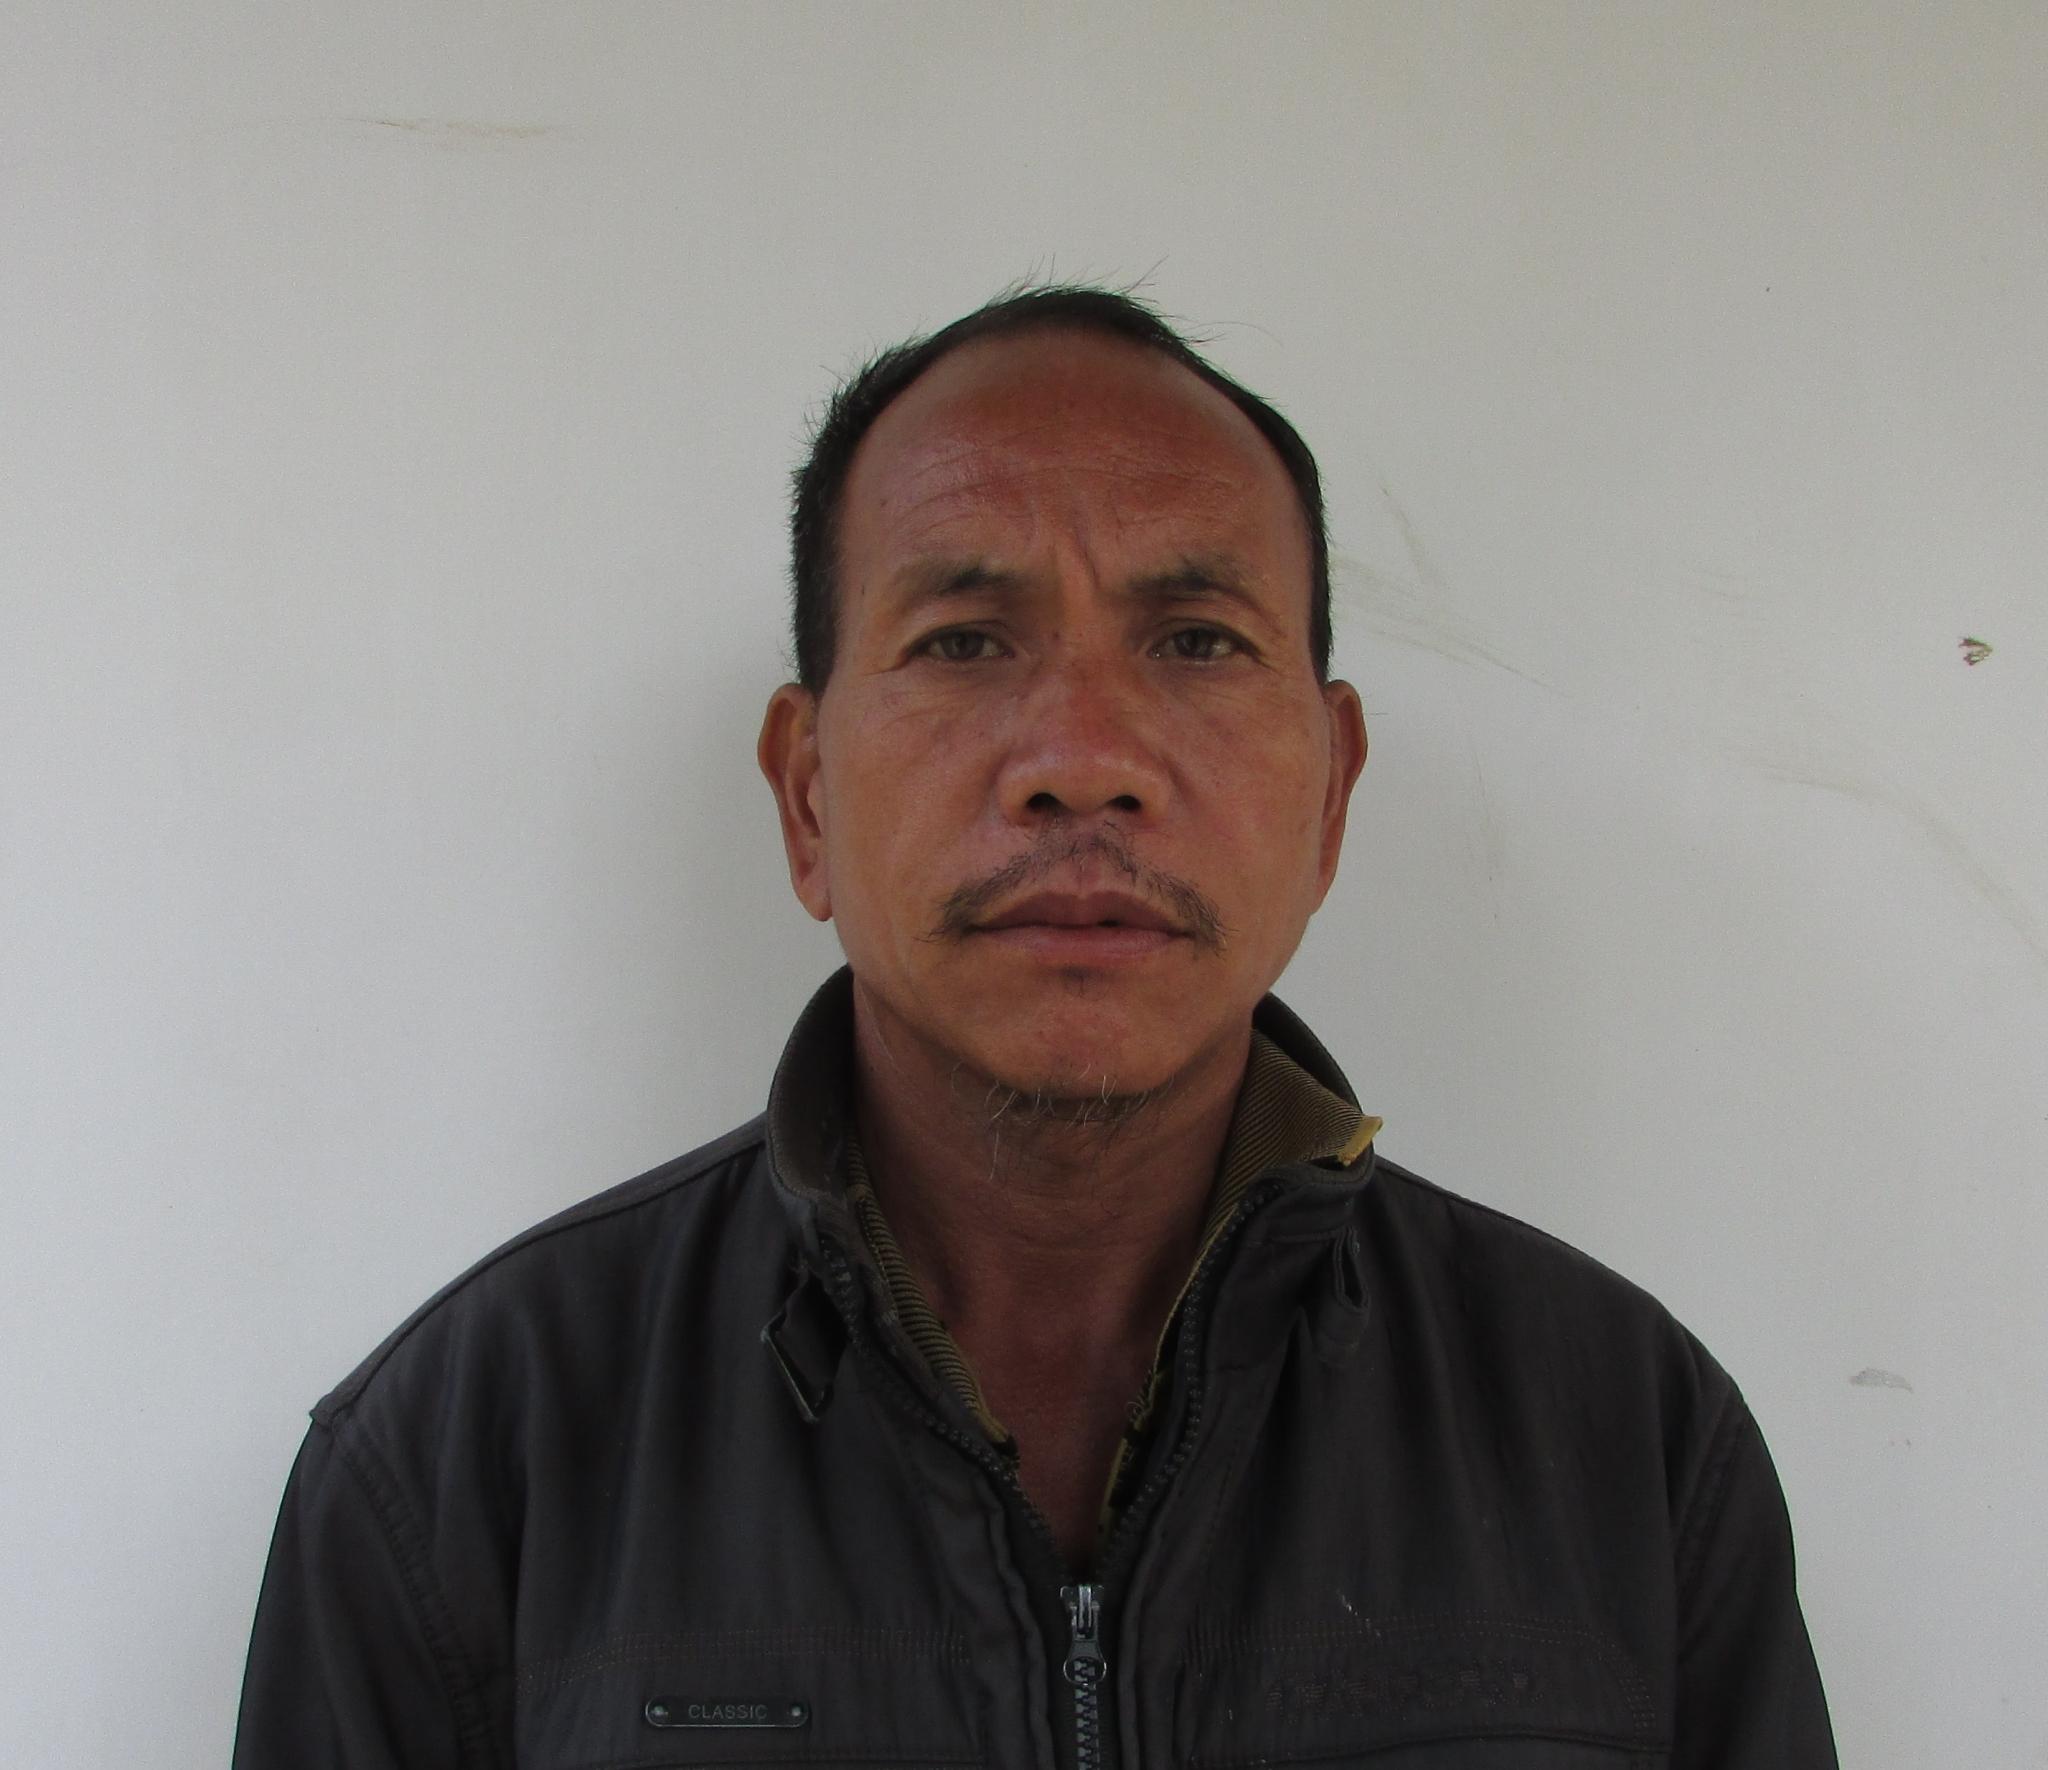 Kaja Kayeng, Nest Protector